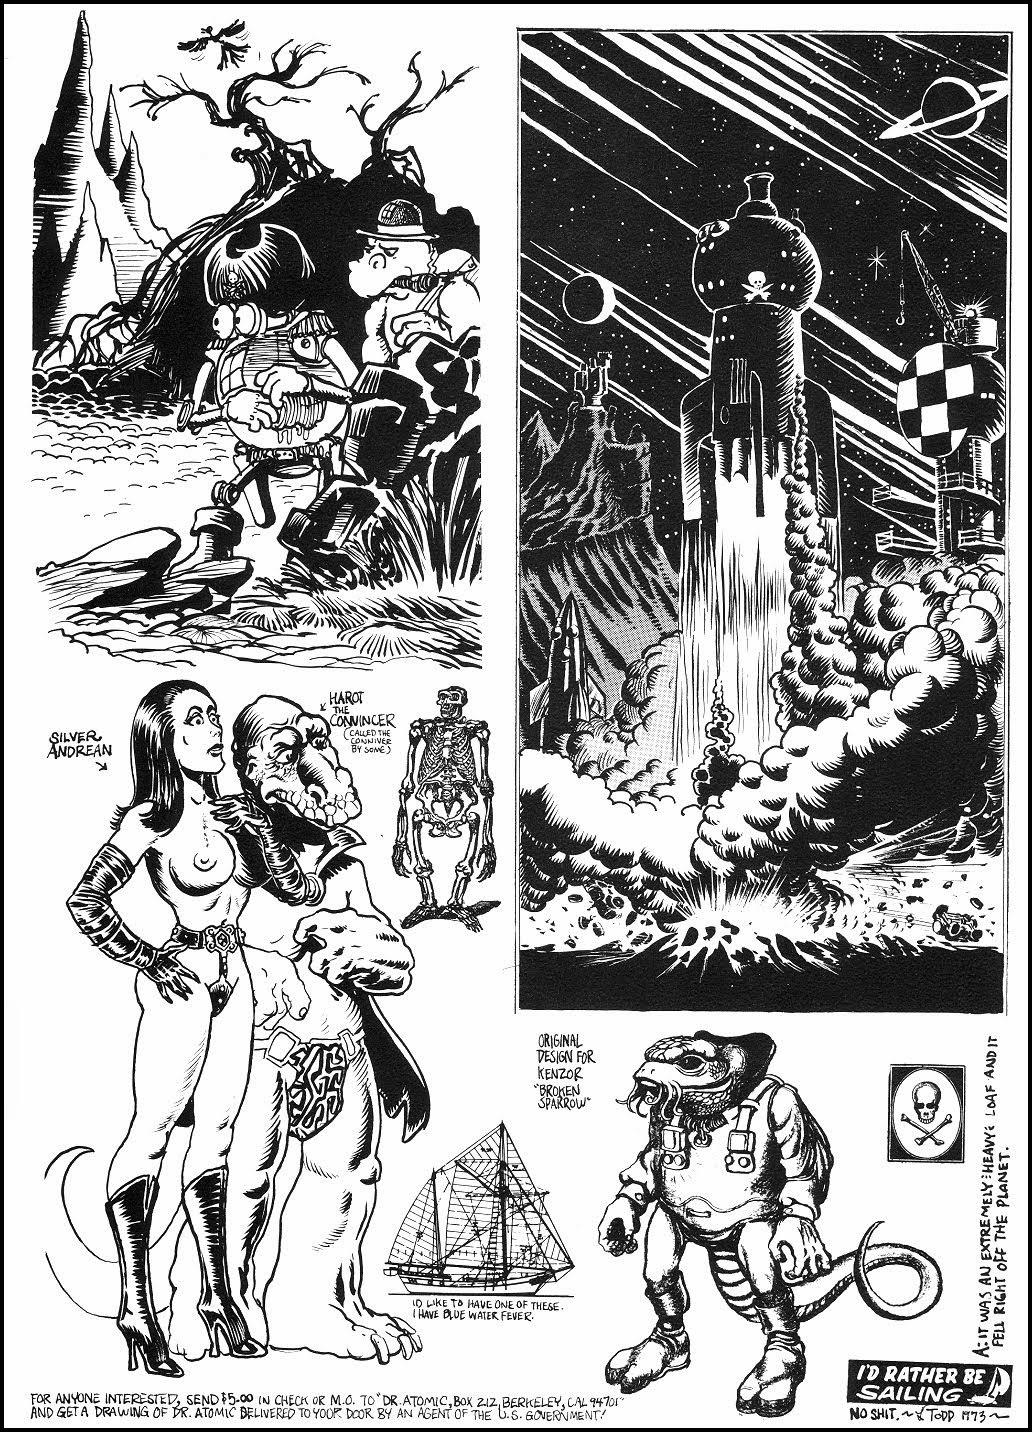 Counterculture (1960s) | 2 Warps to Neptune | Page 2